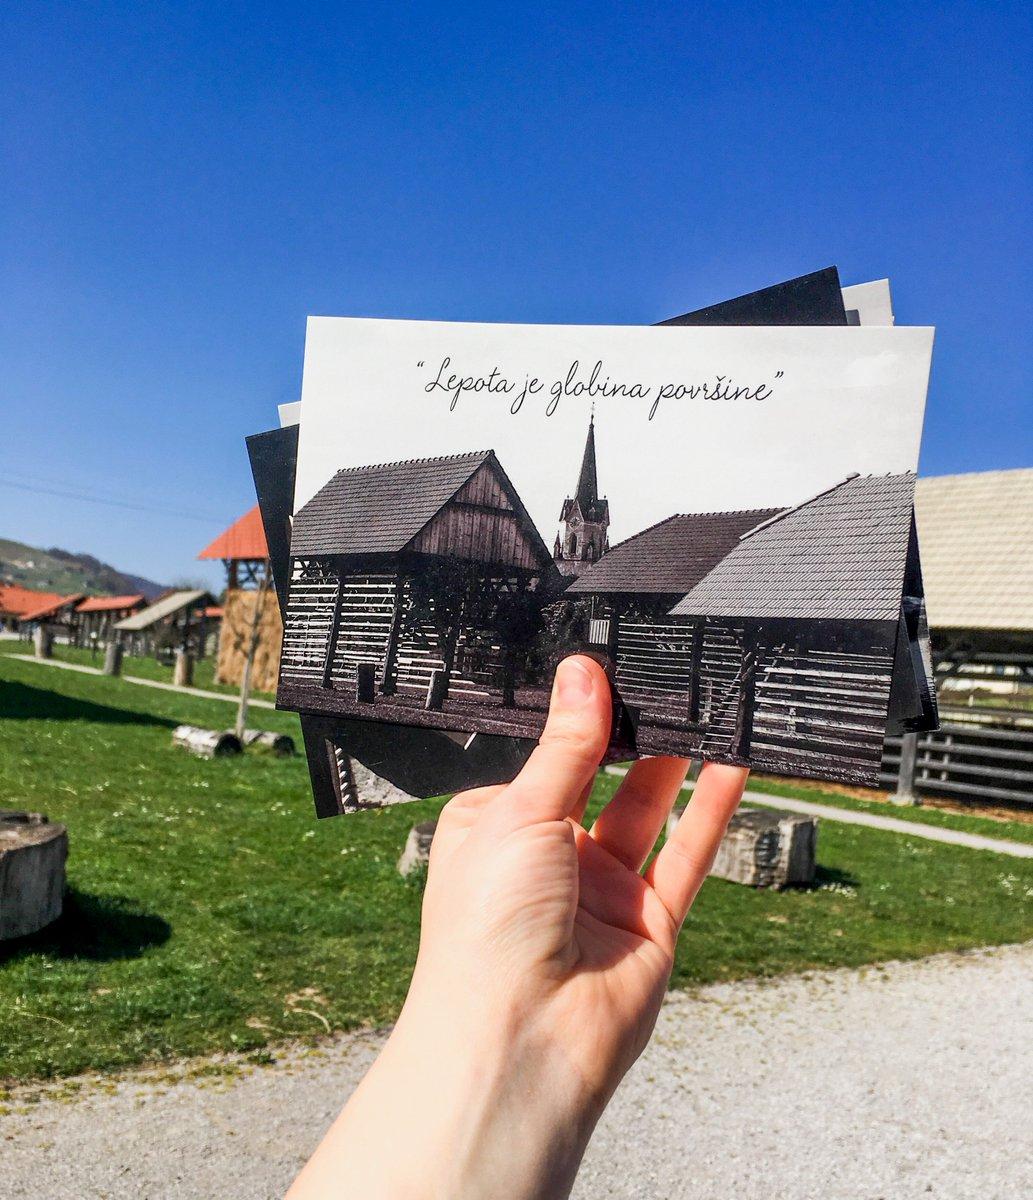 Kje pa vi iščete lepoto?? ☀️🐝🍀  #hayracks @ifeelslovenia @Visitdolenjska #nasvetzaizlet #openairmuseum @igslovenia #Slovenia #instapassport #travelog #gooutside #igslovenija #neverstopexploring #tripadvisor #happyplace